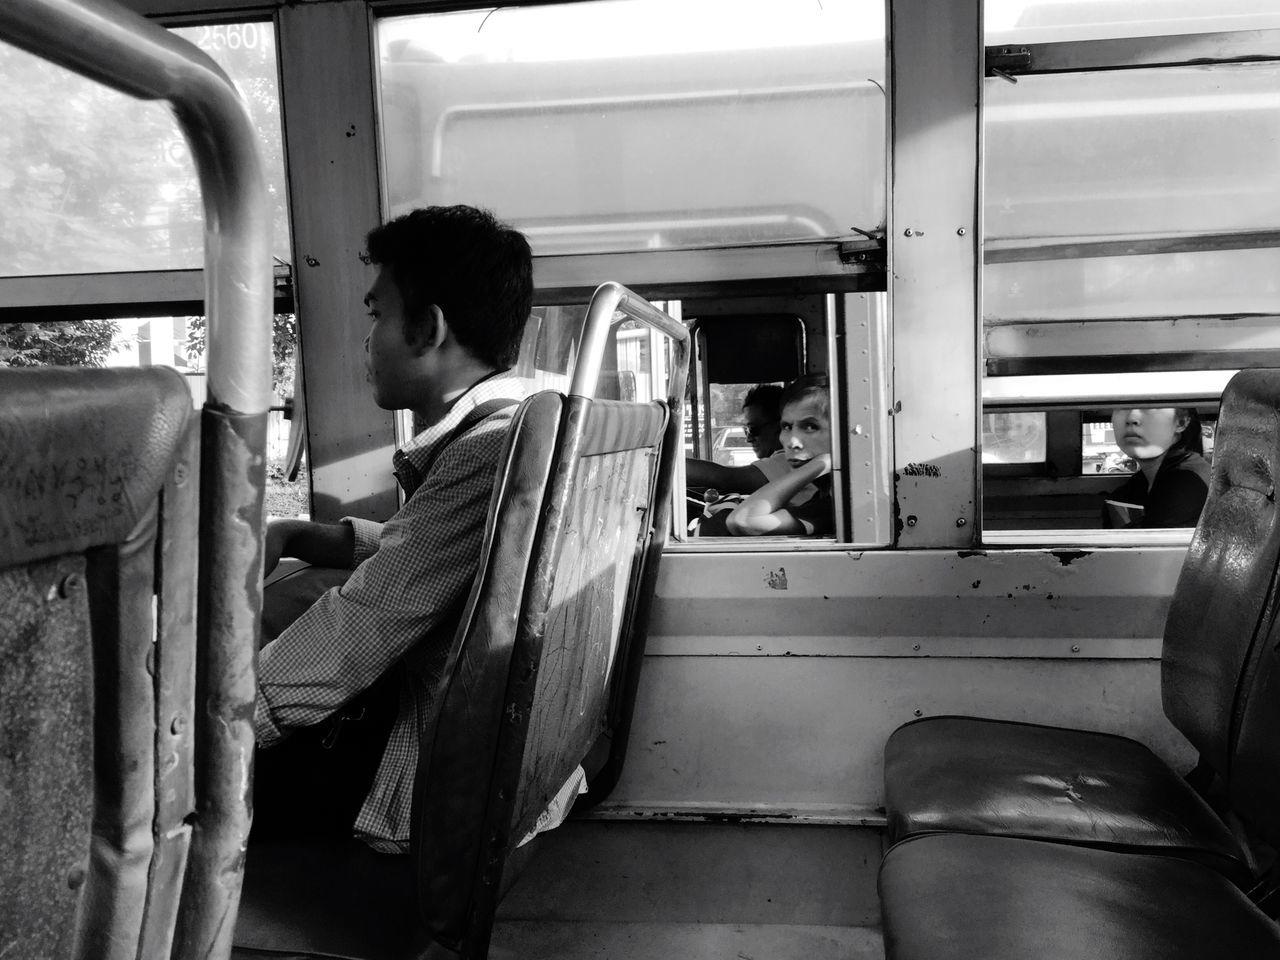 Bus Bus Traffic Jam Transportation Traveling Look Looking At Camera Eye Asian  Man Thailand Bangkokbus Pepole Street Life